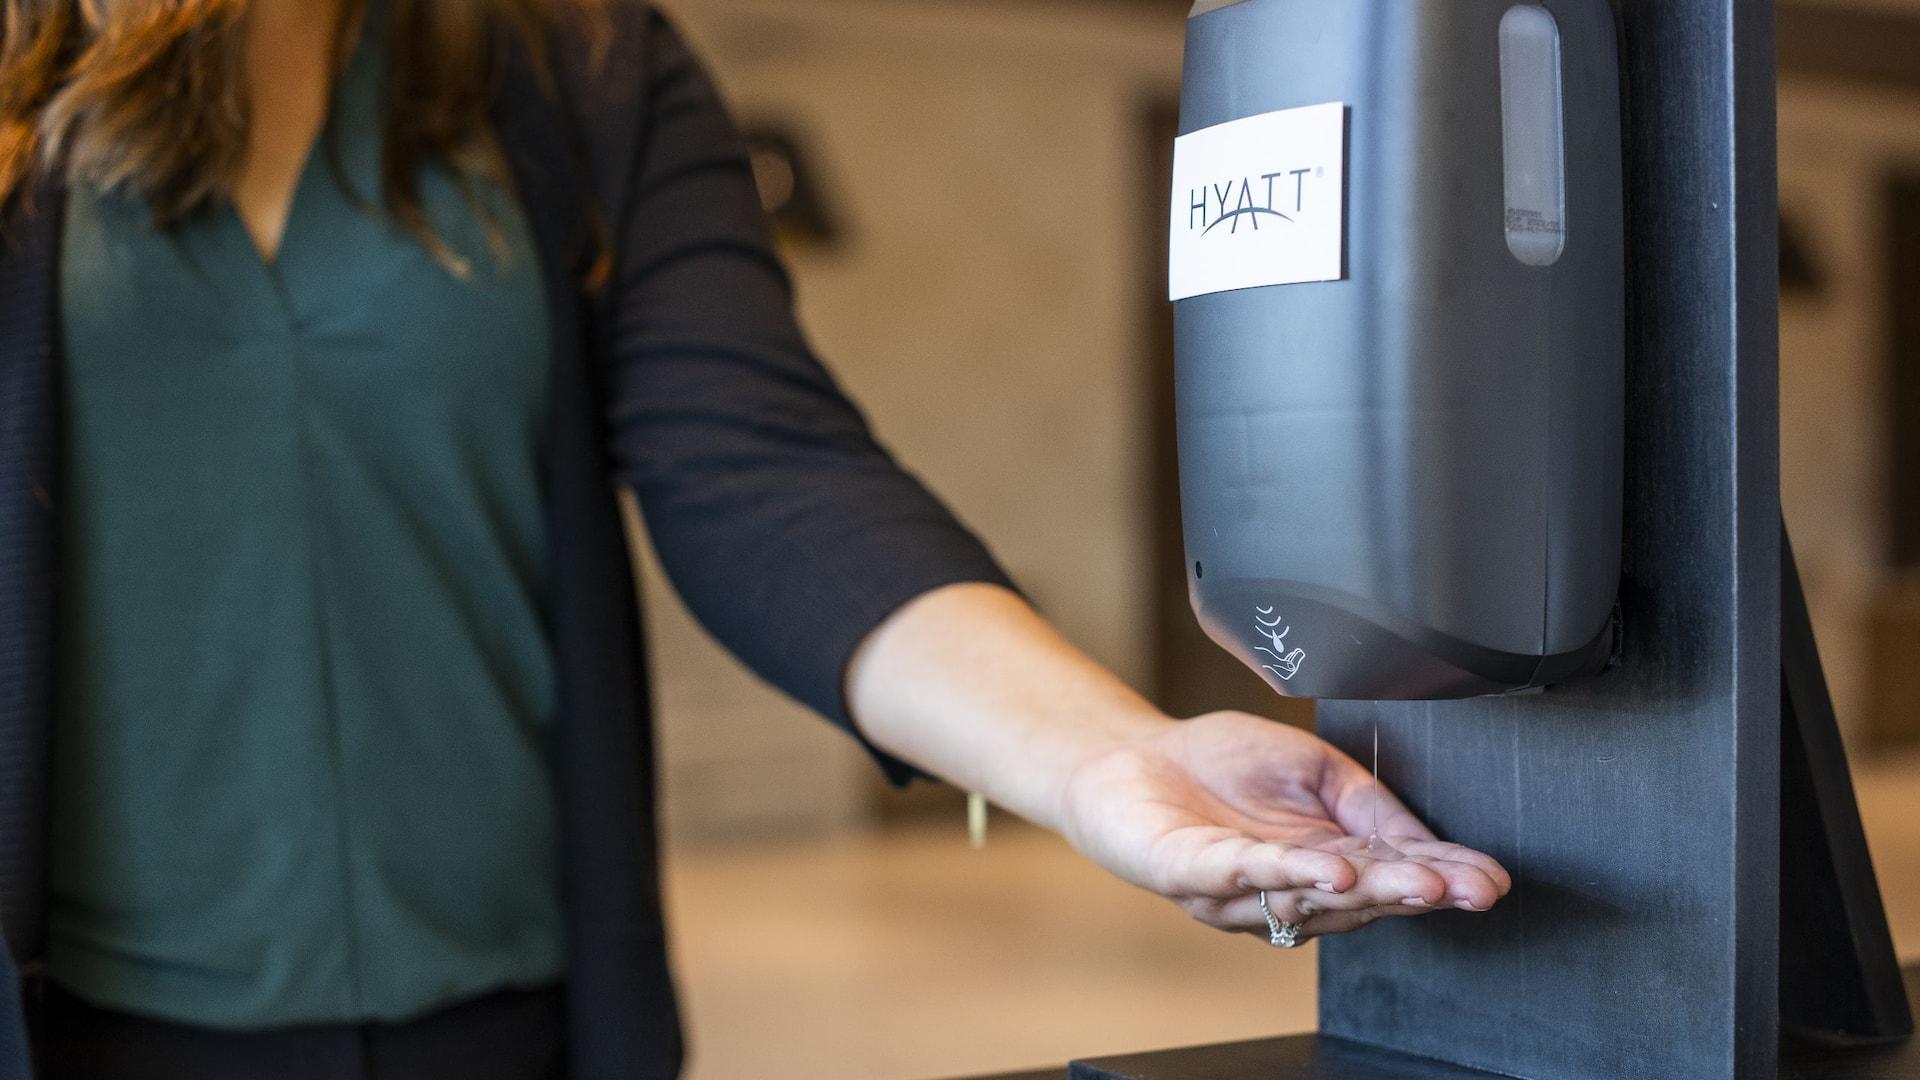 Hand sanitizing station at Hyatt Regency Lake Washington